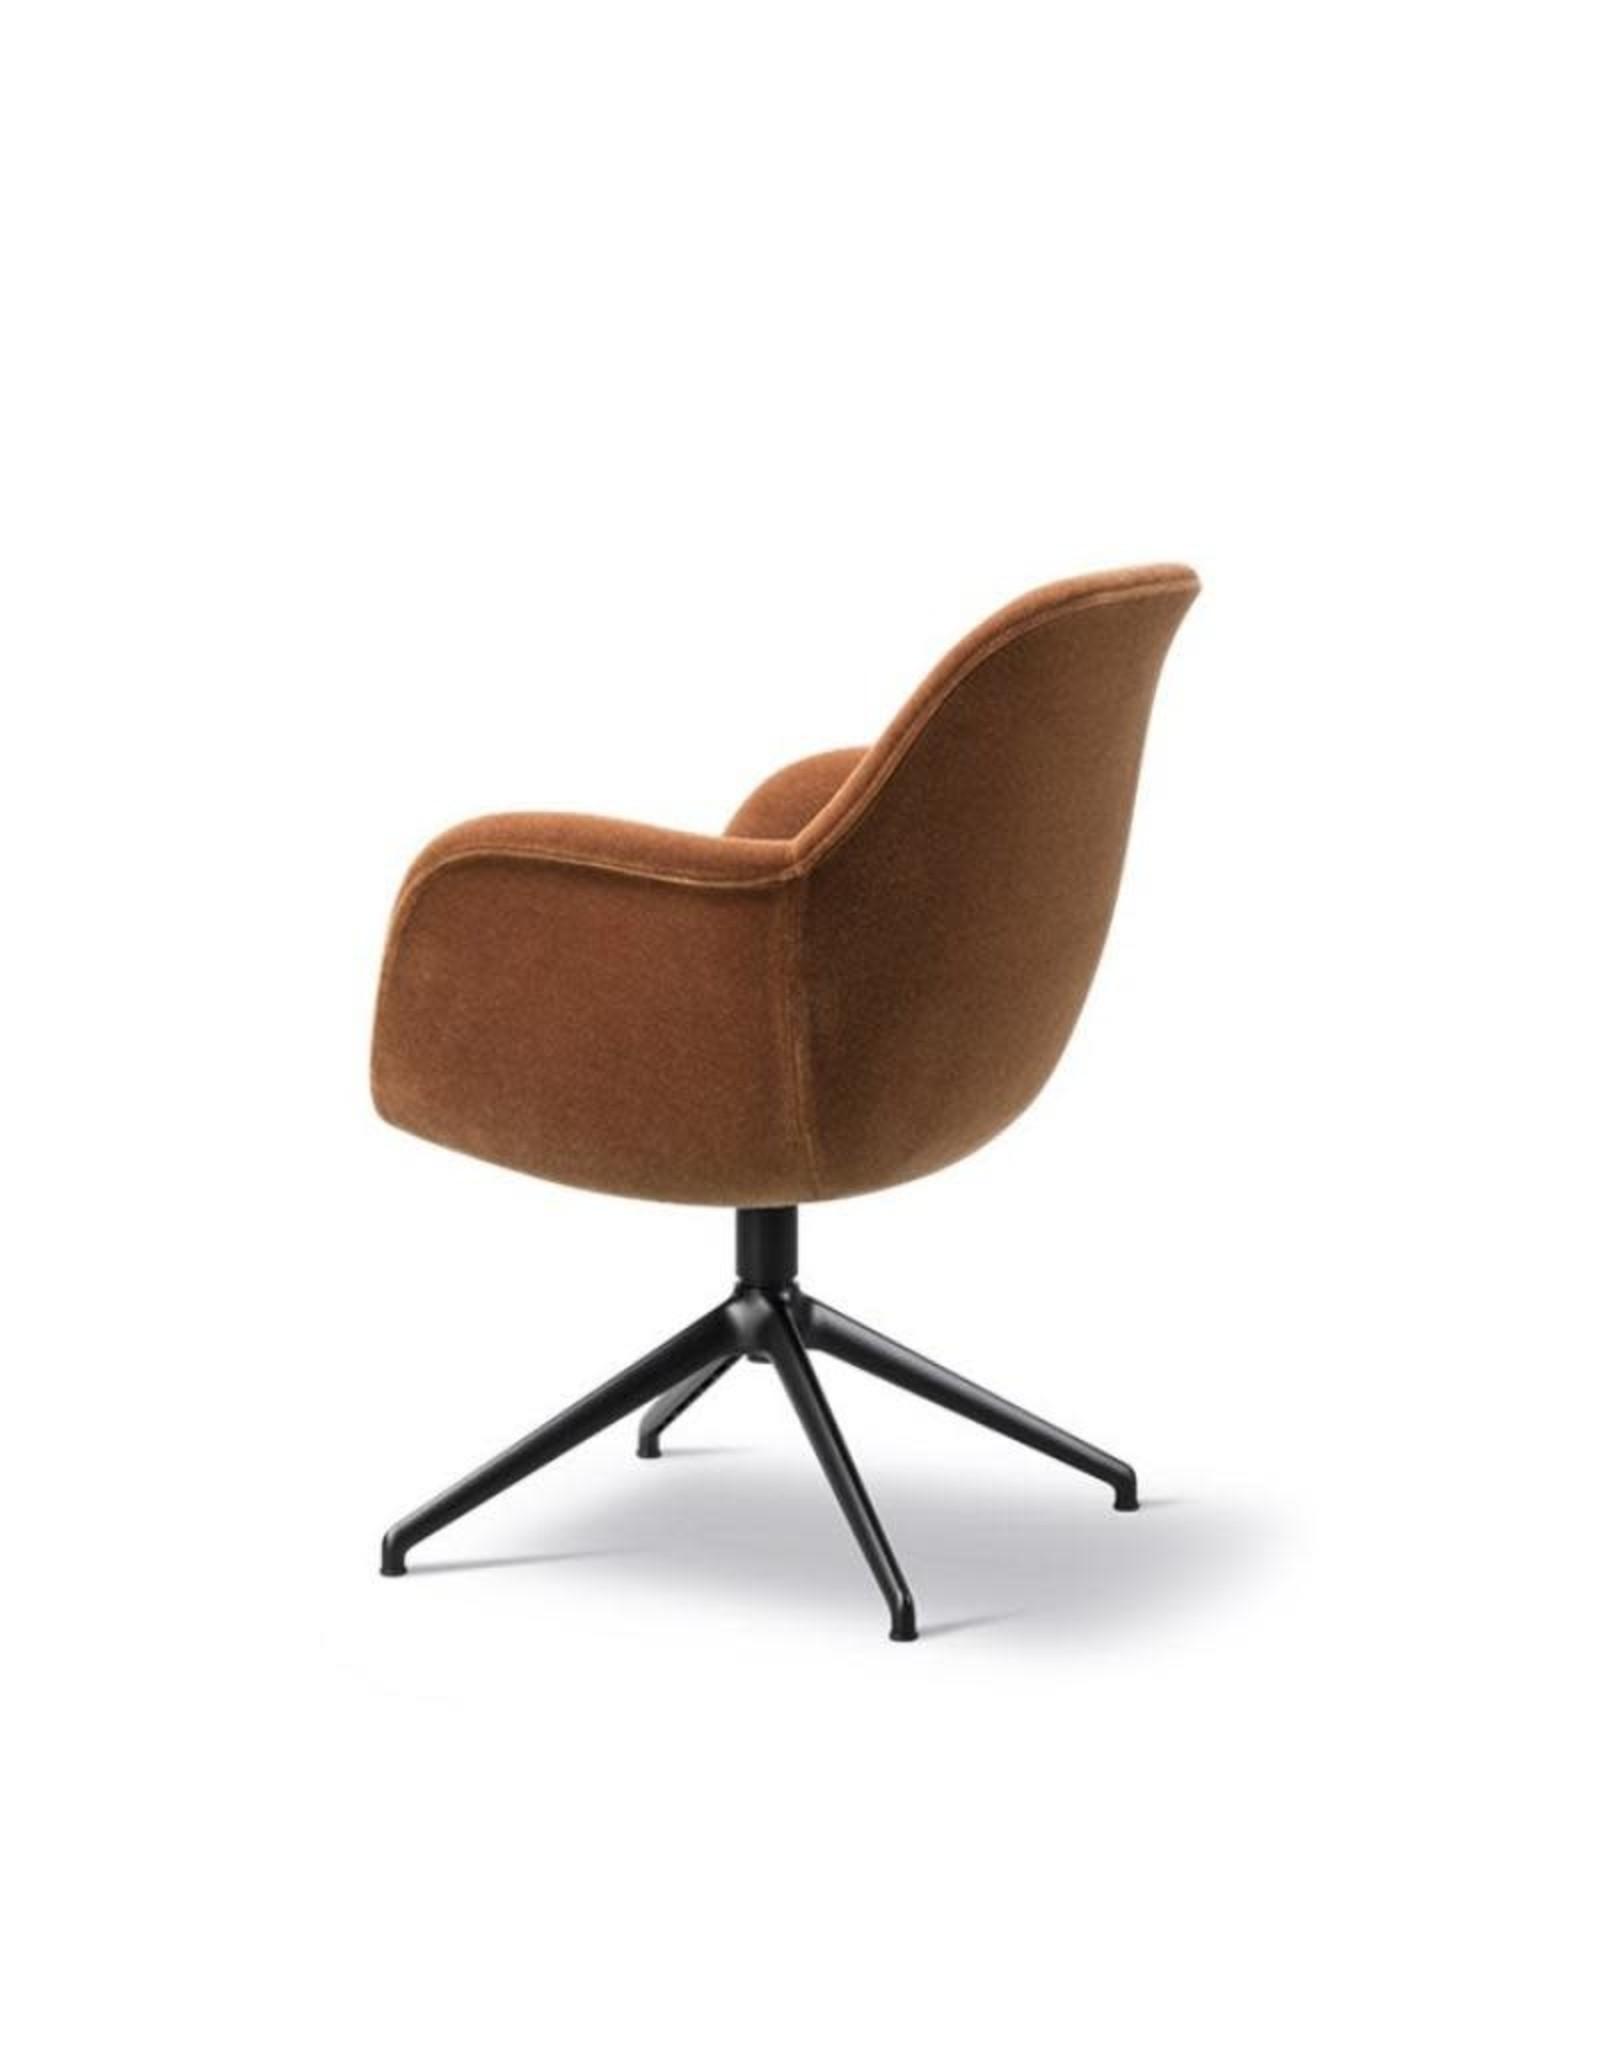 1779 SWOON 轉椅